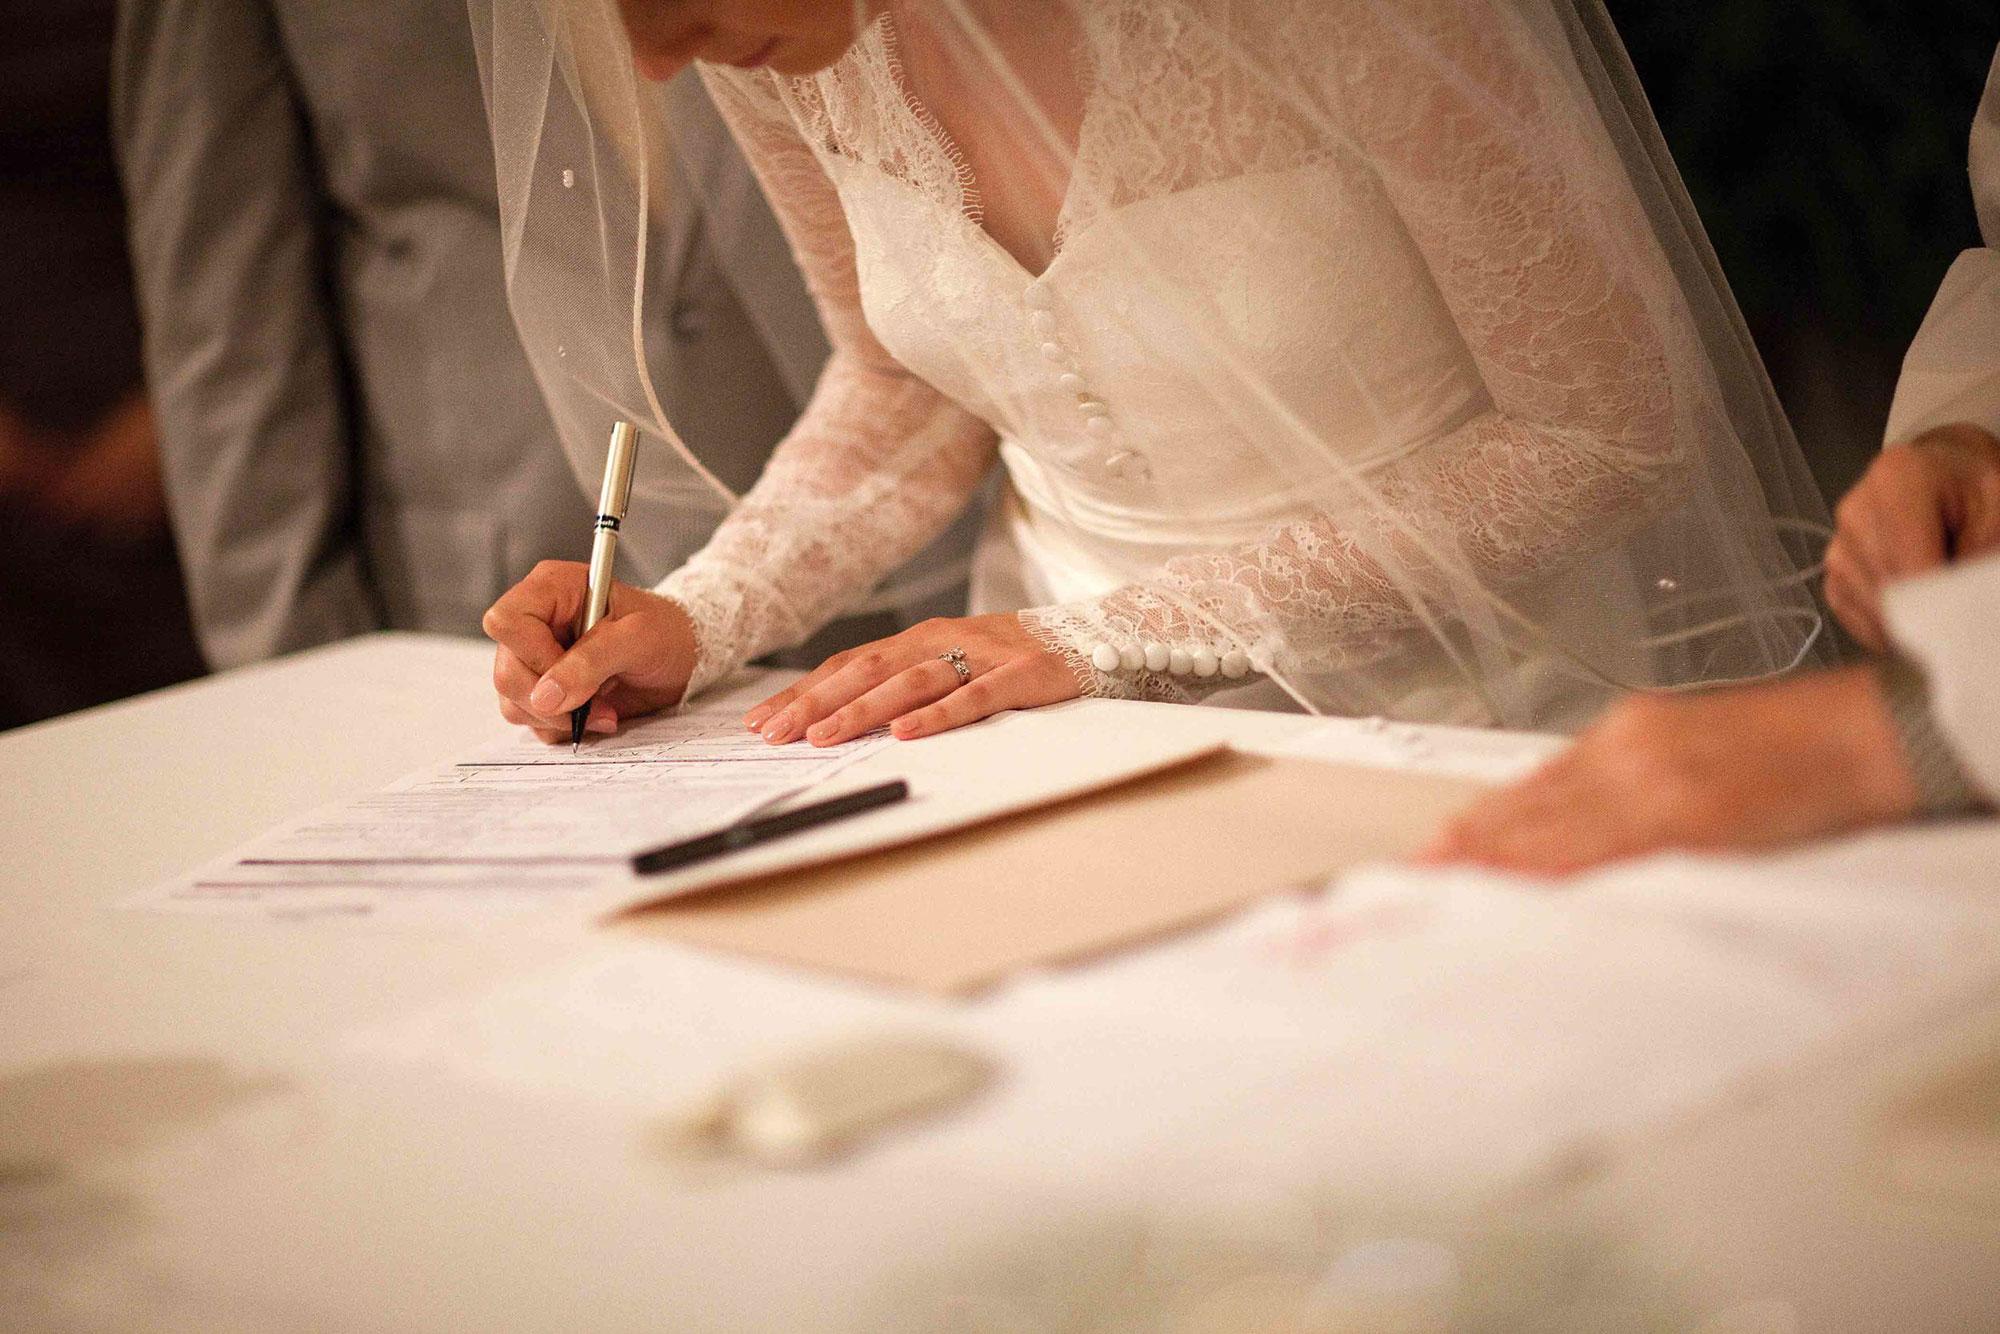 Amanda-Cowley-Willowbank-Vineyard-Bride-Photo-By-White-Photographie-008.jpg